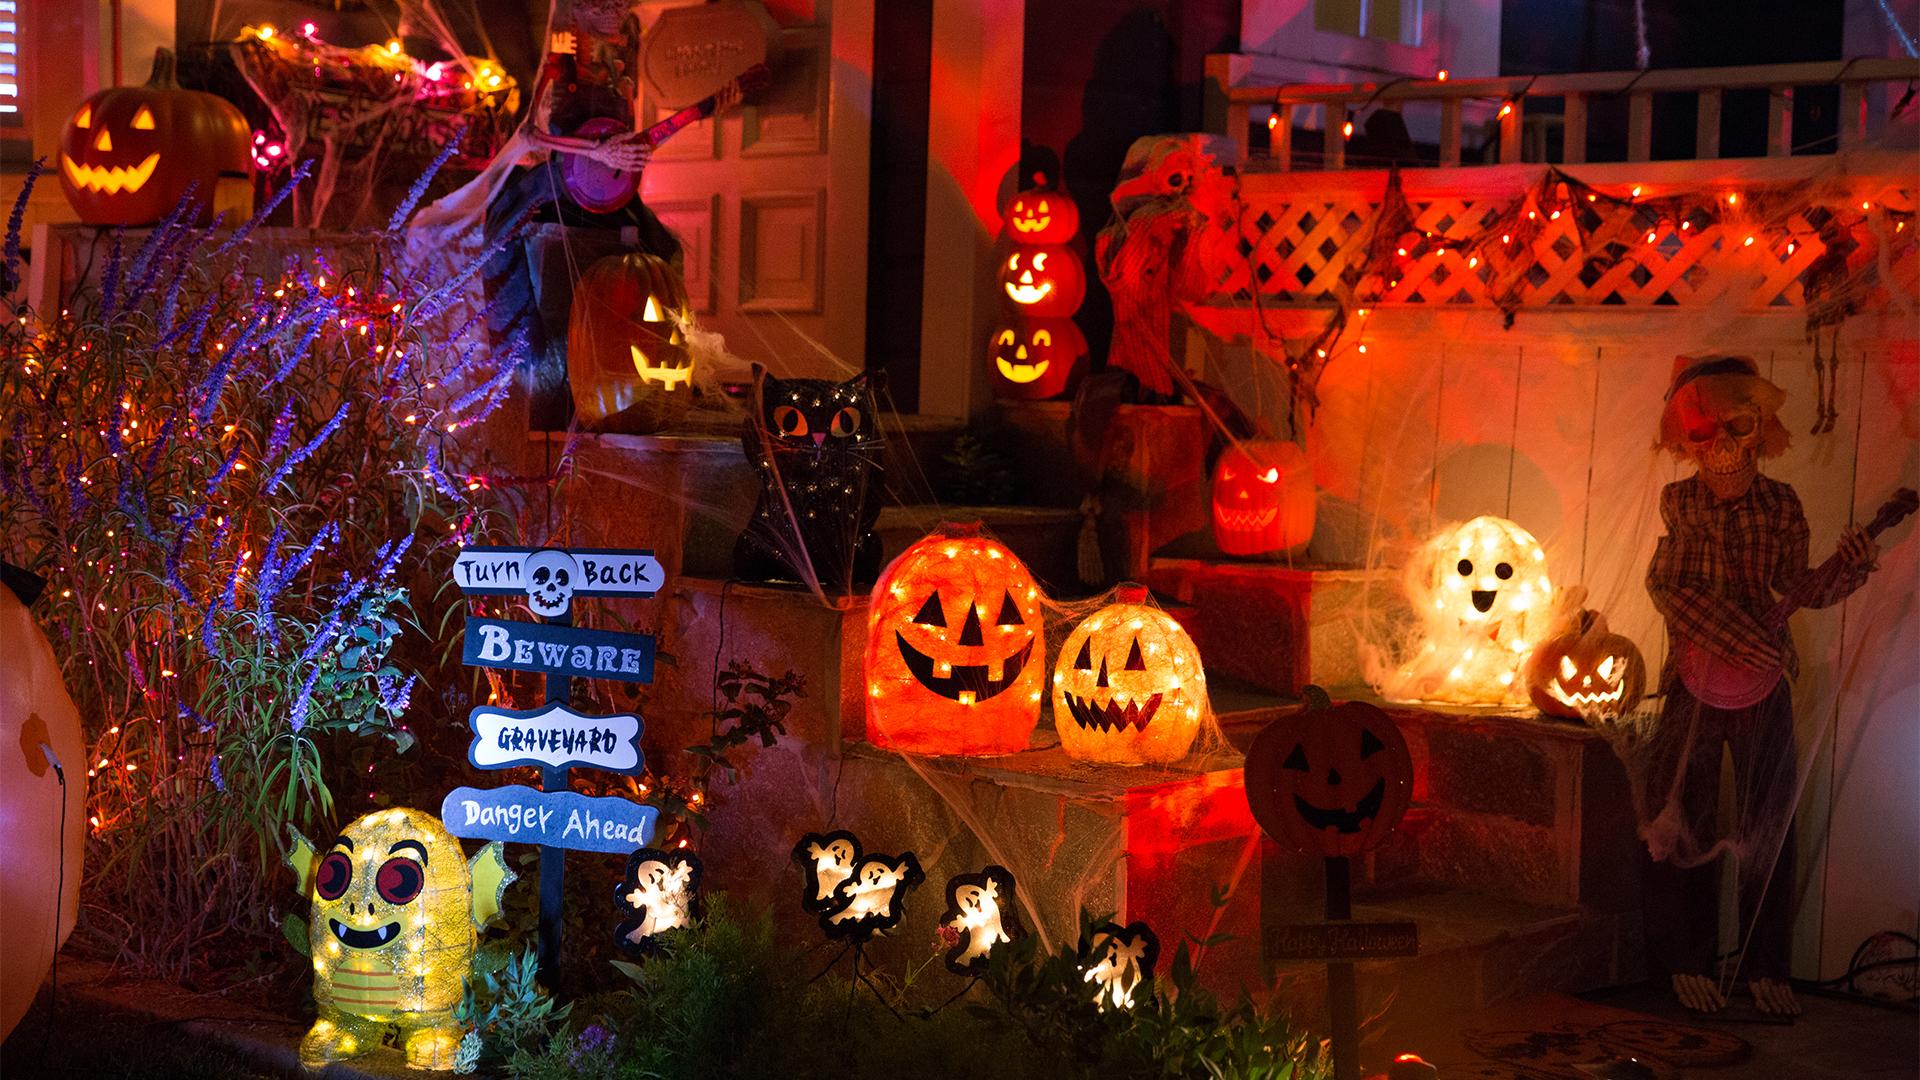 Halloween Expo Michigan 2020 Halloween 2020: List of local events | WFLA